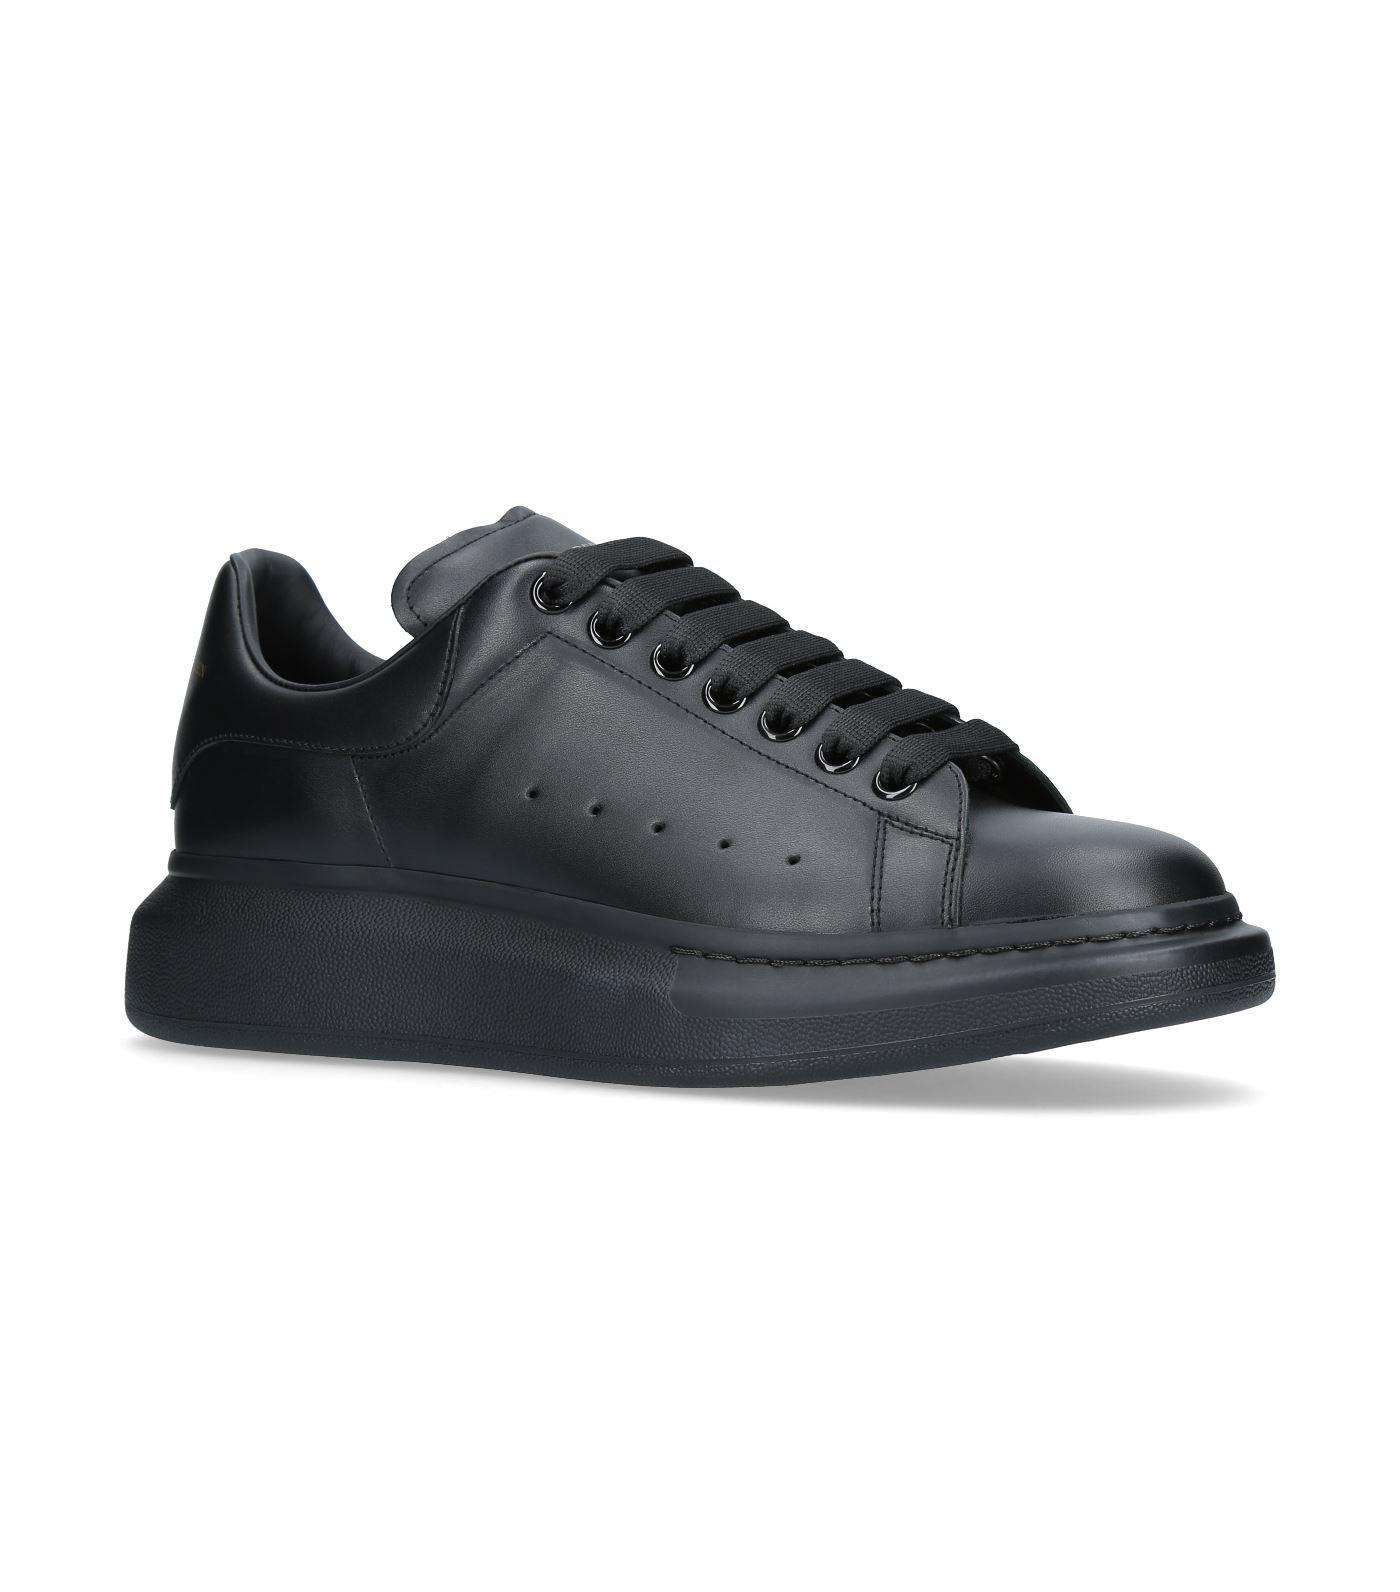 Alexander Mcqueen Show Leather Platform Trainers In Black